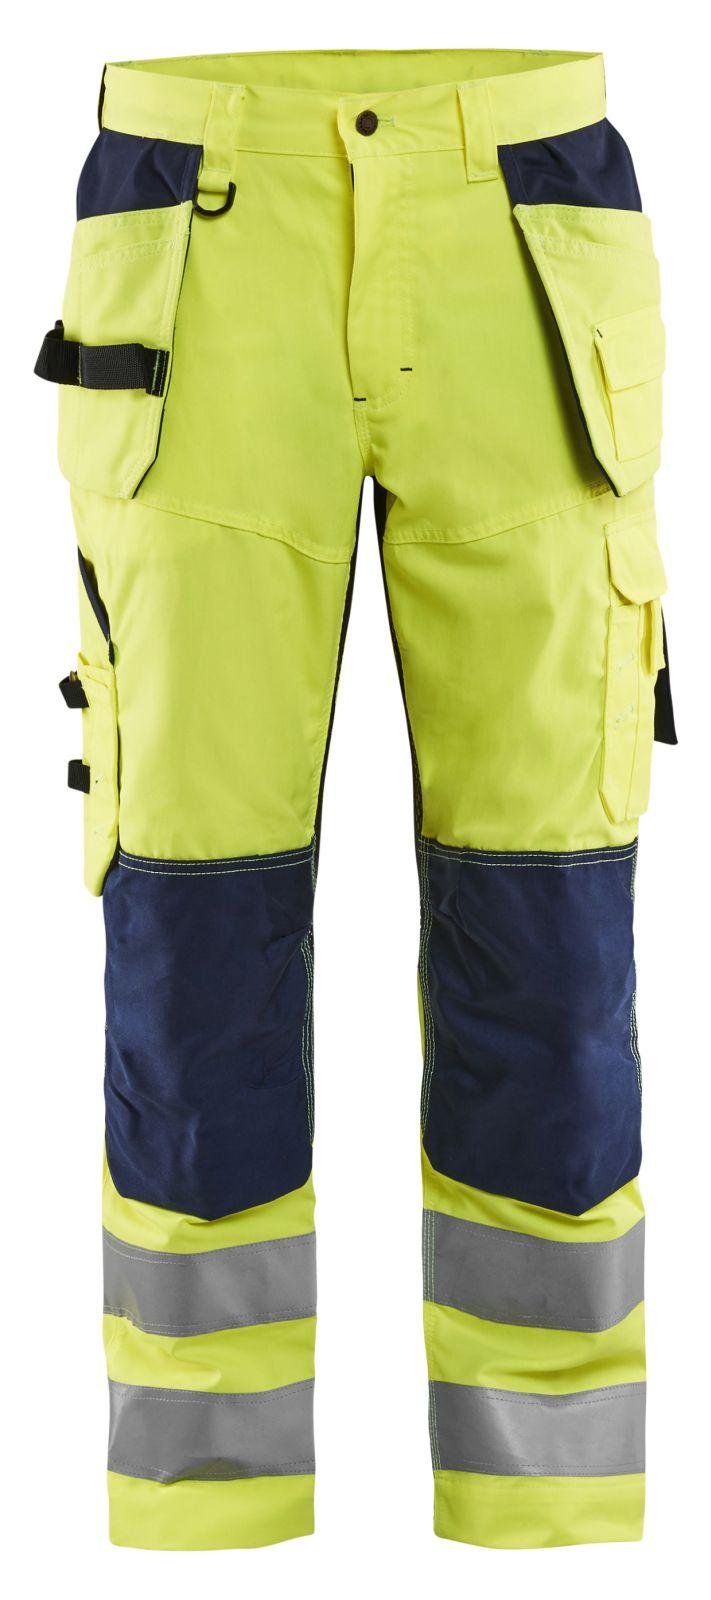 Blaklader Werkbroeken 15651811 High Vis geel-marineblauw(3389)